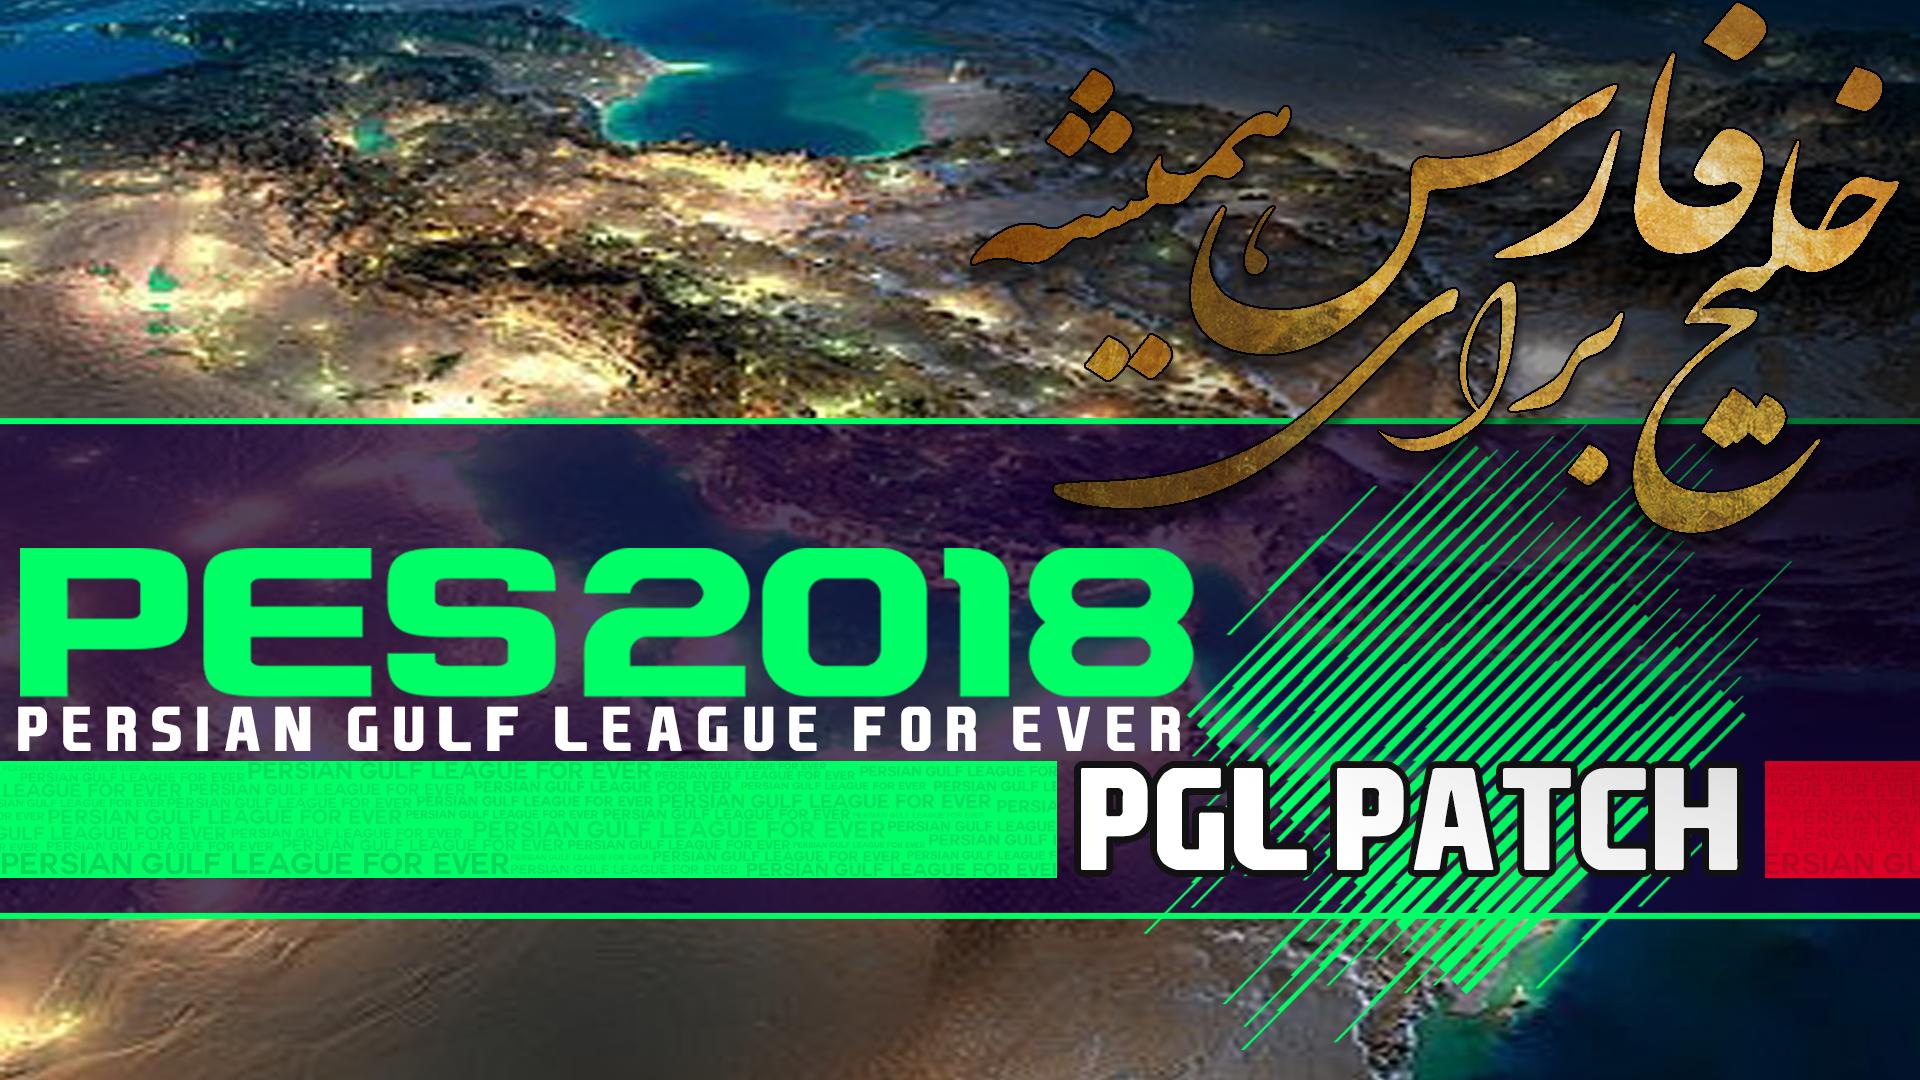 PES 2018 PGL StartScreen copy - دانلود پچ لیگ برتر ایران برای PES2018 فصل 1396/97 | کاملا رایگان + فیکس